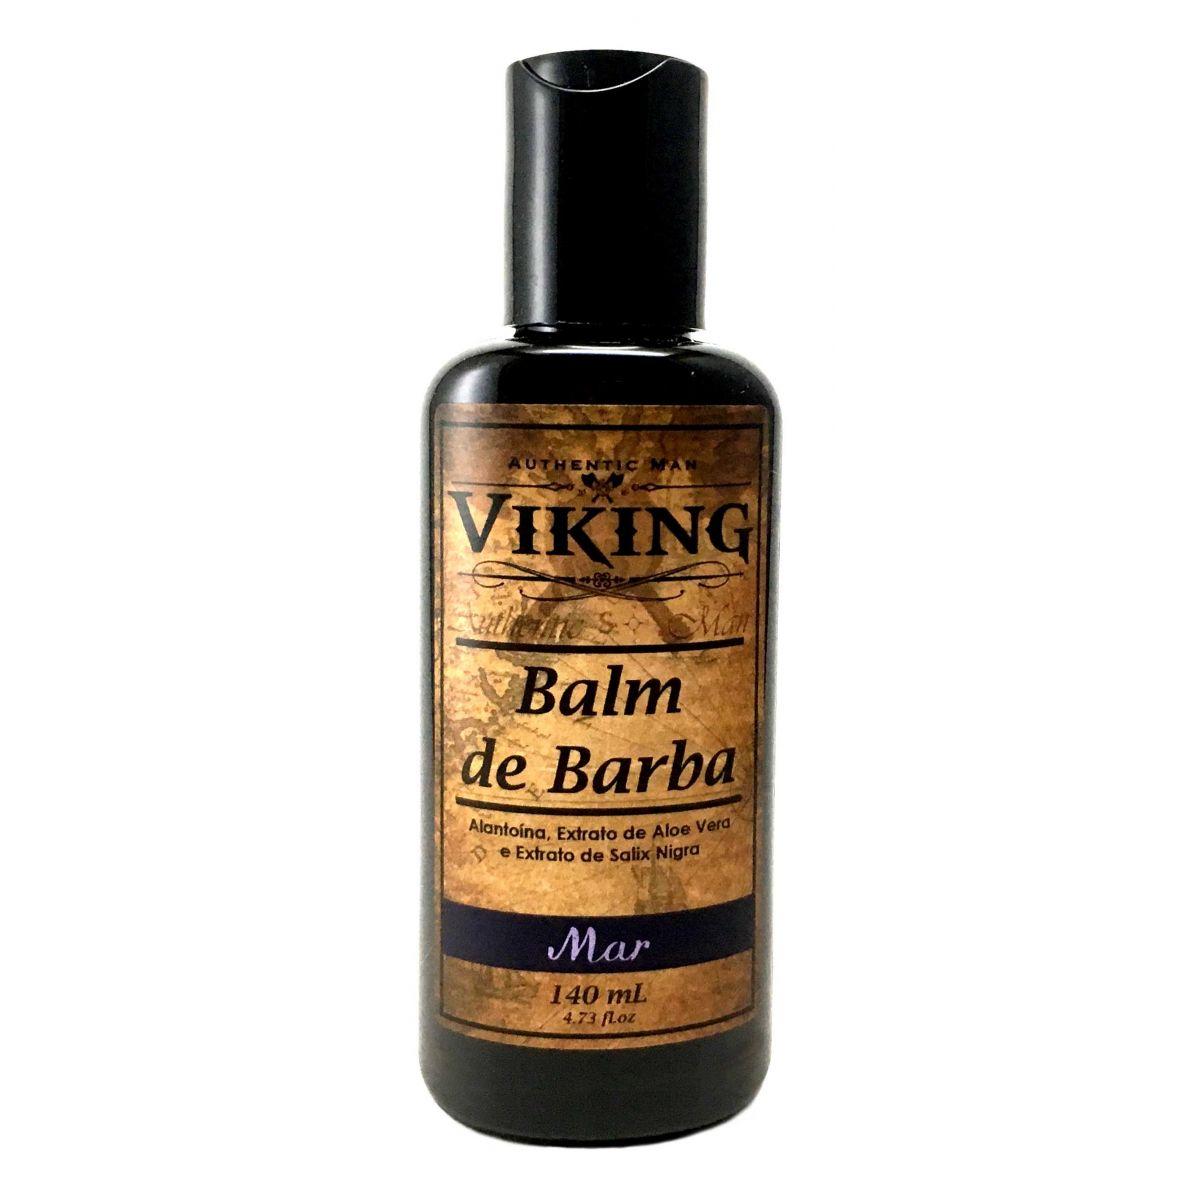 Balm de Barba Mar Viking - 140mL